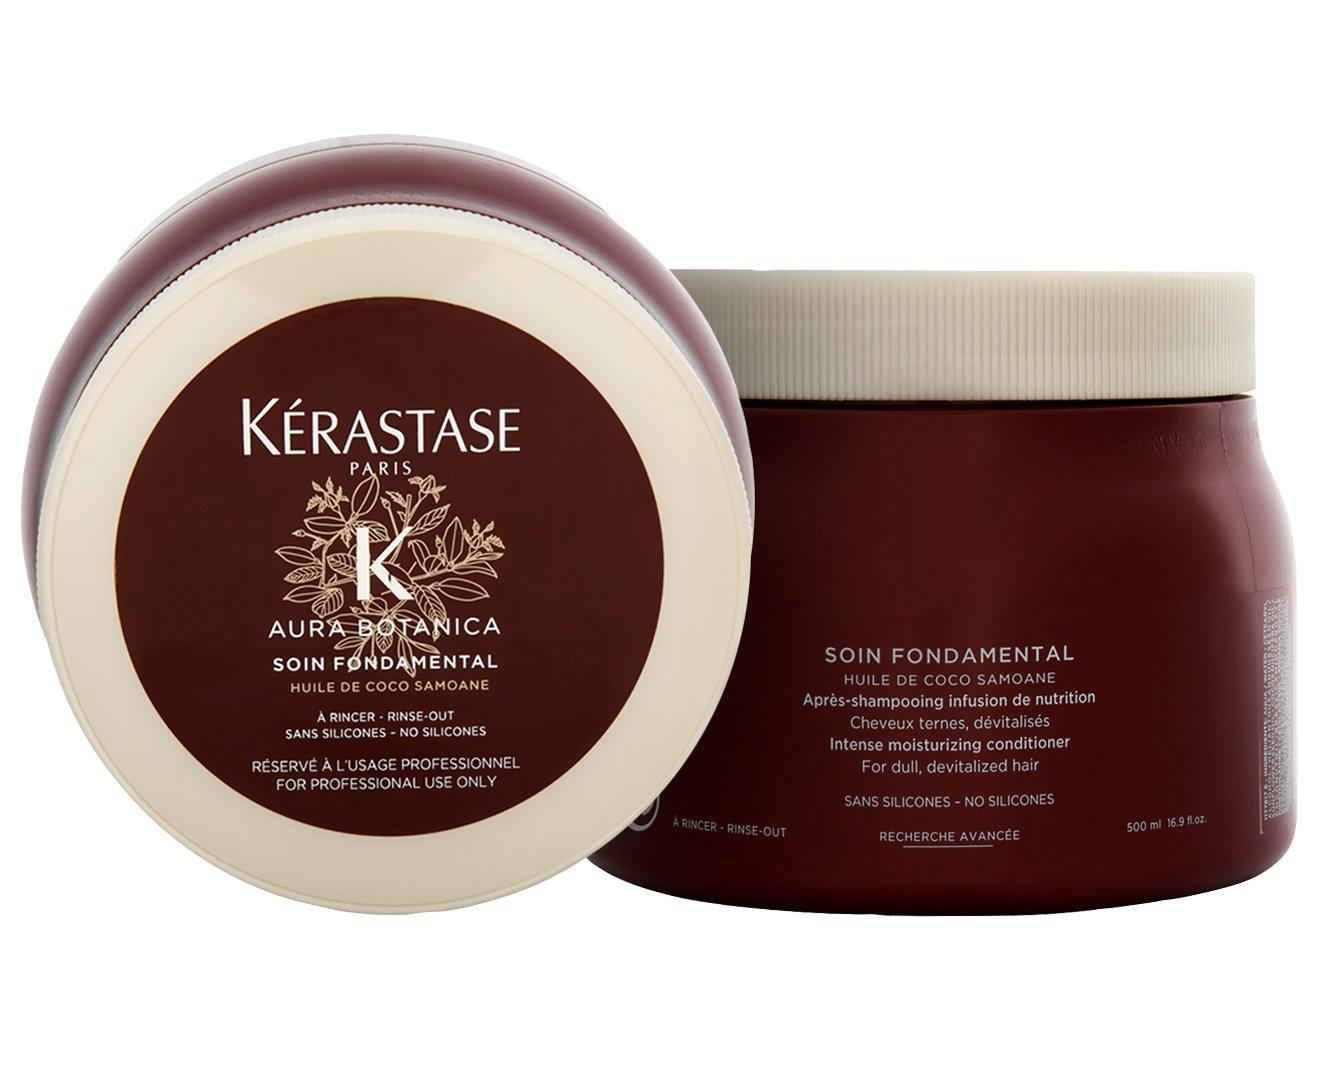 Kerastase Aura Botanica Soin Fondamental Intense Moisturizing Conditioner for Dull Devitalized Hair, 16.9 Ounce AFB International E2124800